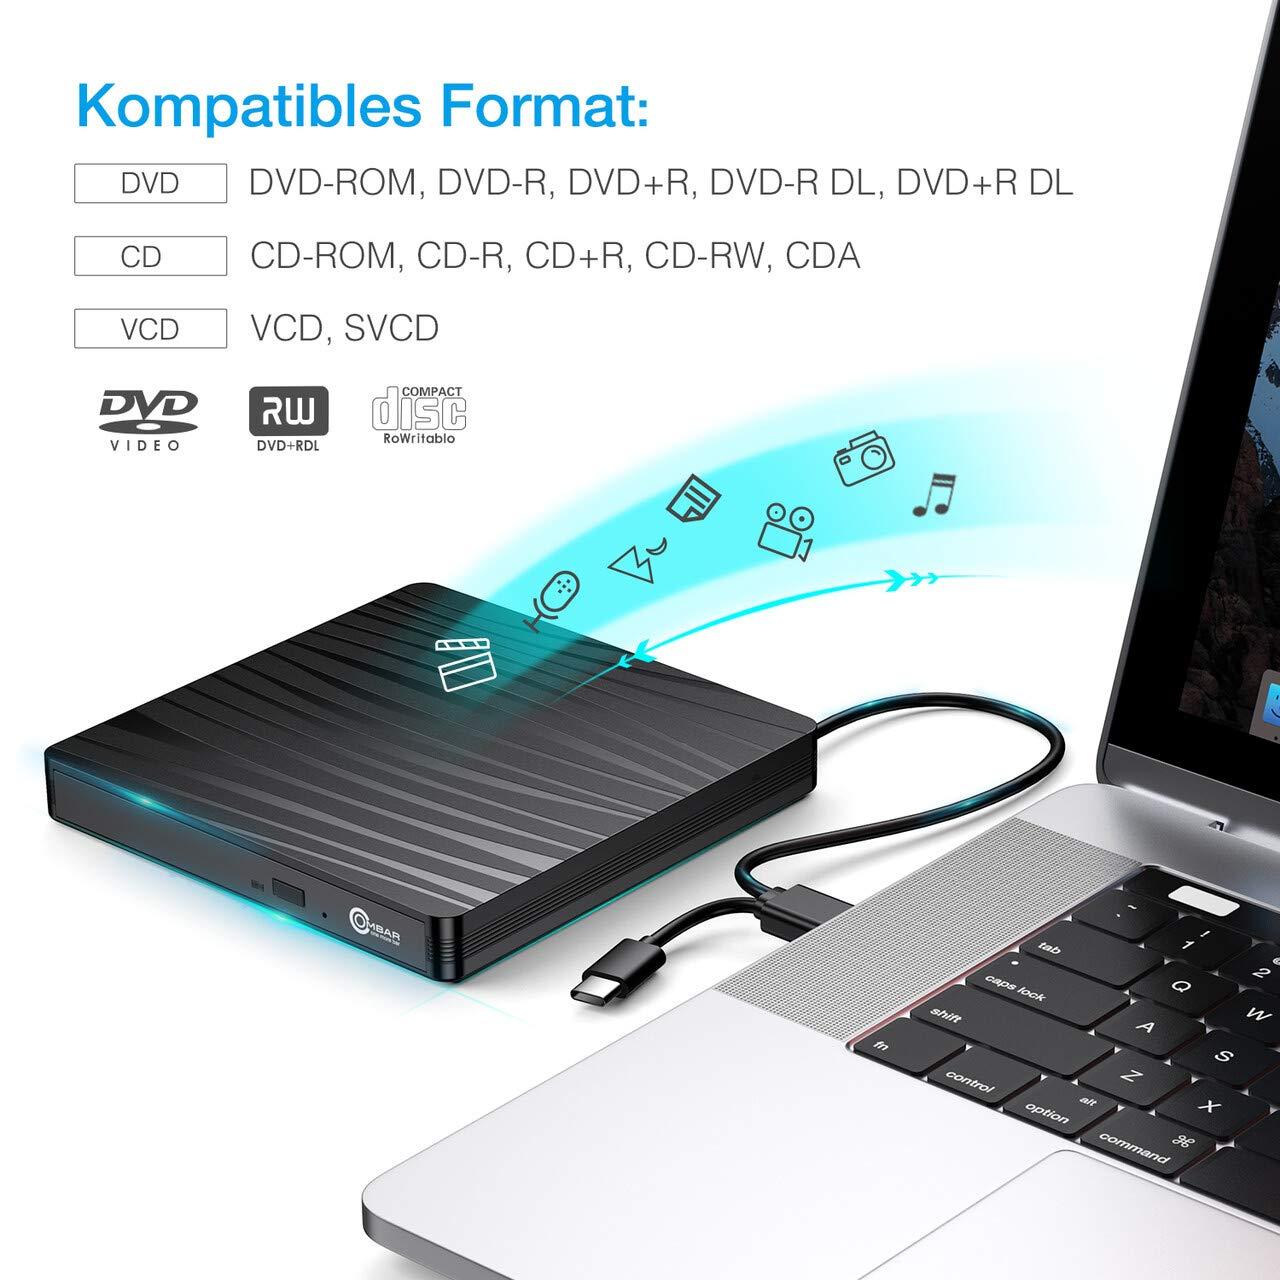 OMBAR Extenes CD/DVD Laufwerk Brenner, 2 in 1 External CD/DVD Drive mit USB 3.0/Type-C für Desktops, Laptops, MacBook, das System eignet Windows XP / 2003 / Vista / 7/8.1/10, Linux, Mac OS